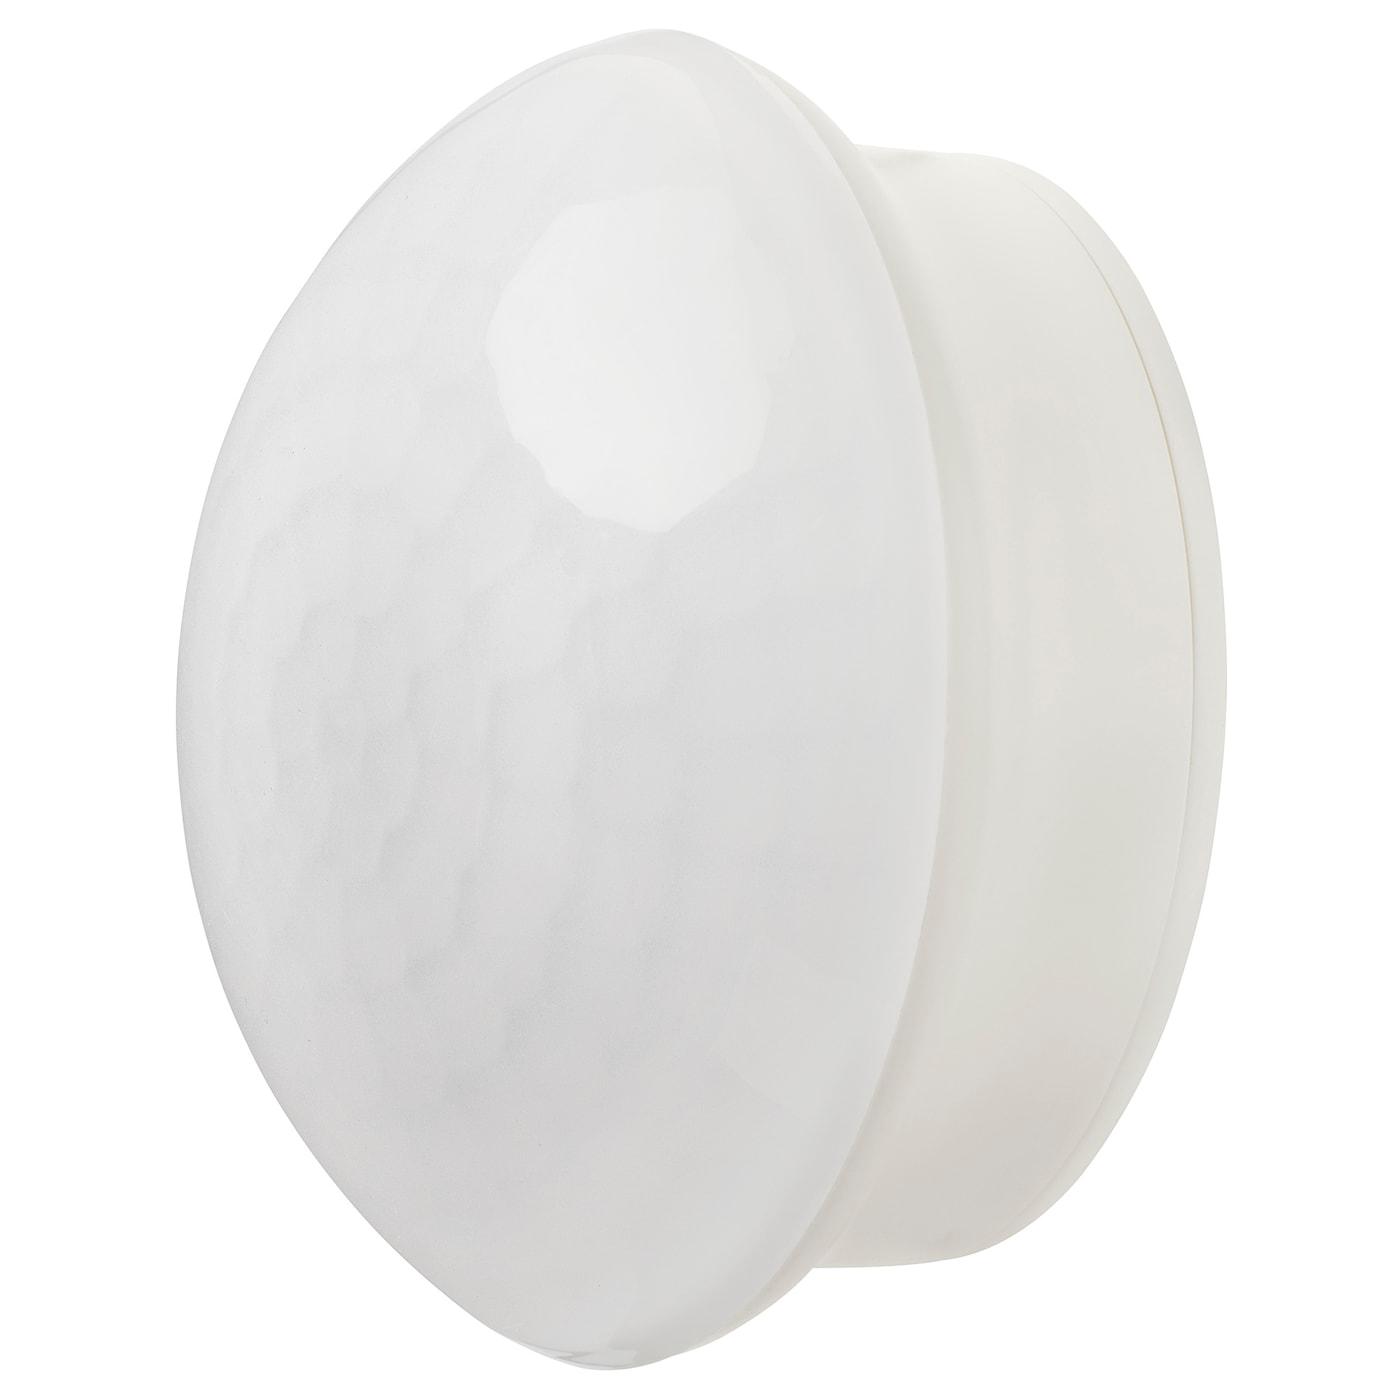 MOLGAN Led-verlichting Wit/op batterijen - IKEA